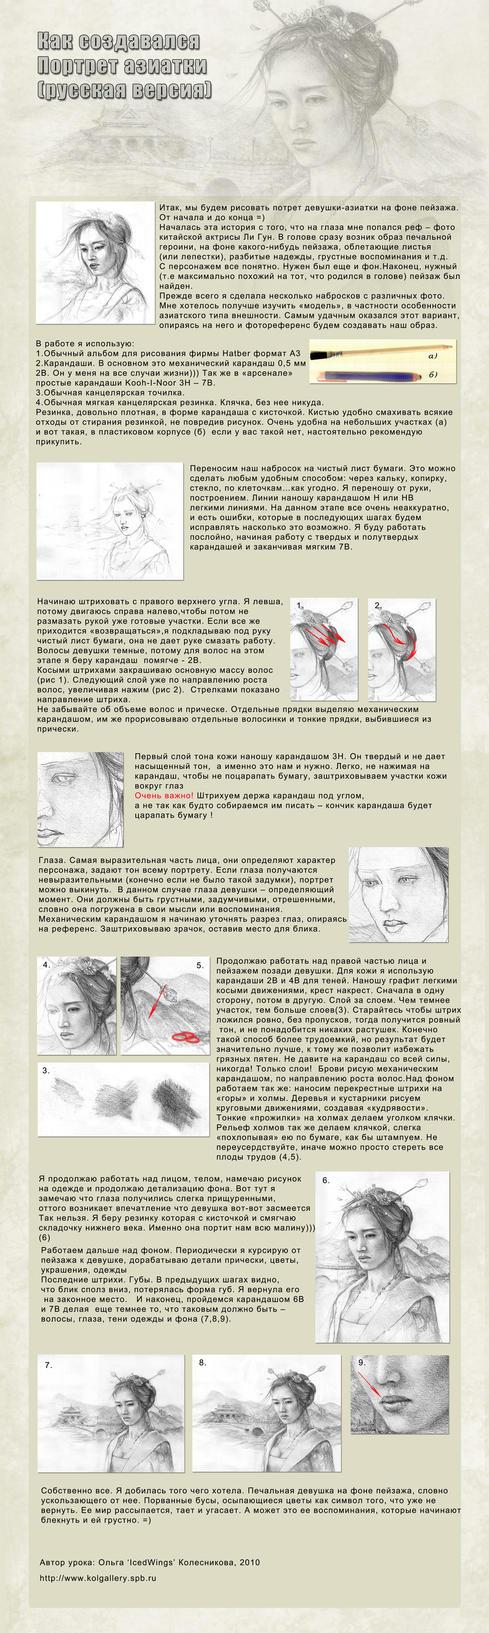 Asian girl tutorial by IcedWingsArt